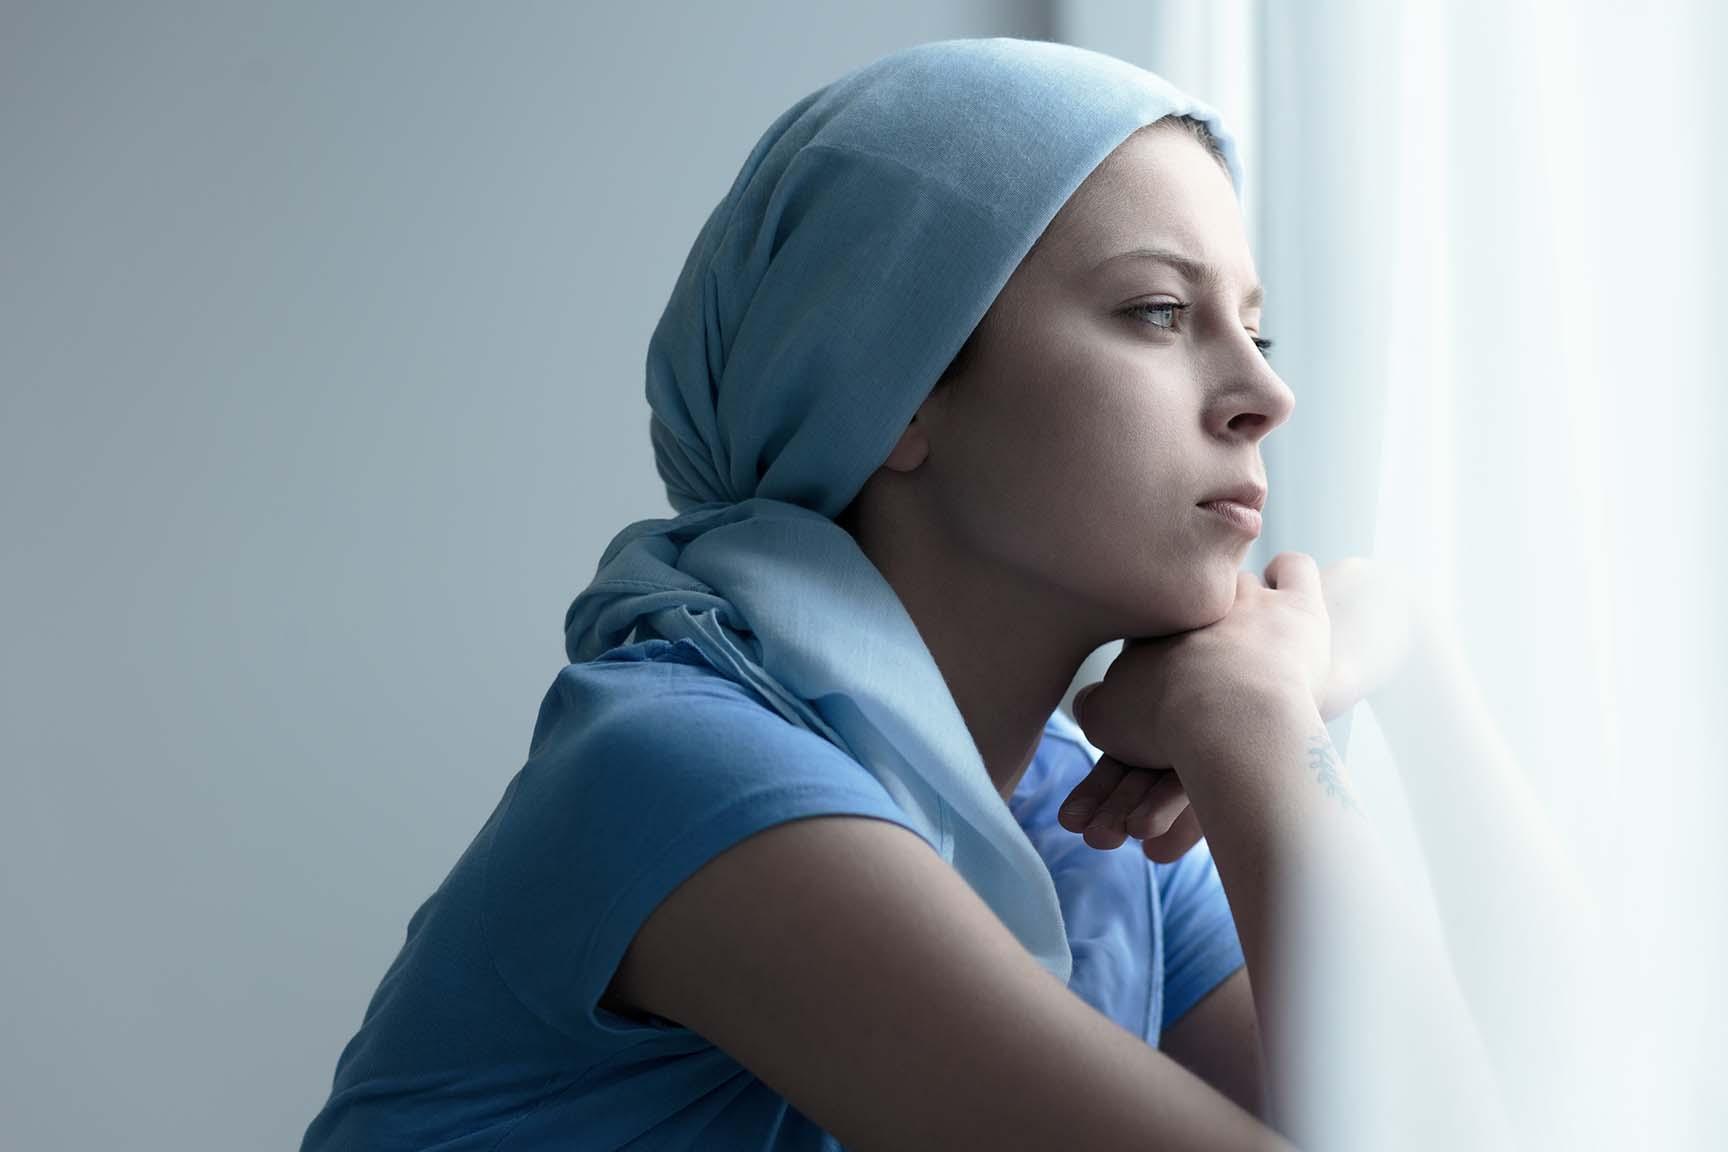 CANCER: A Journey of Emotional Cascades